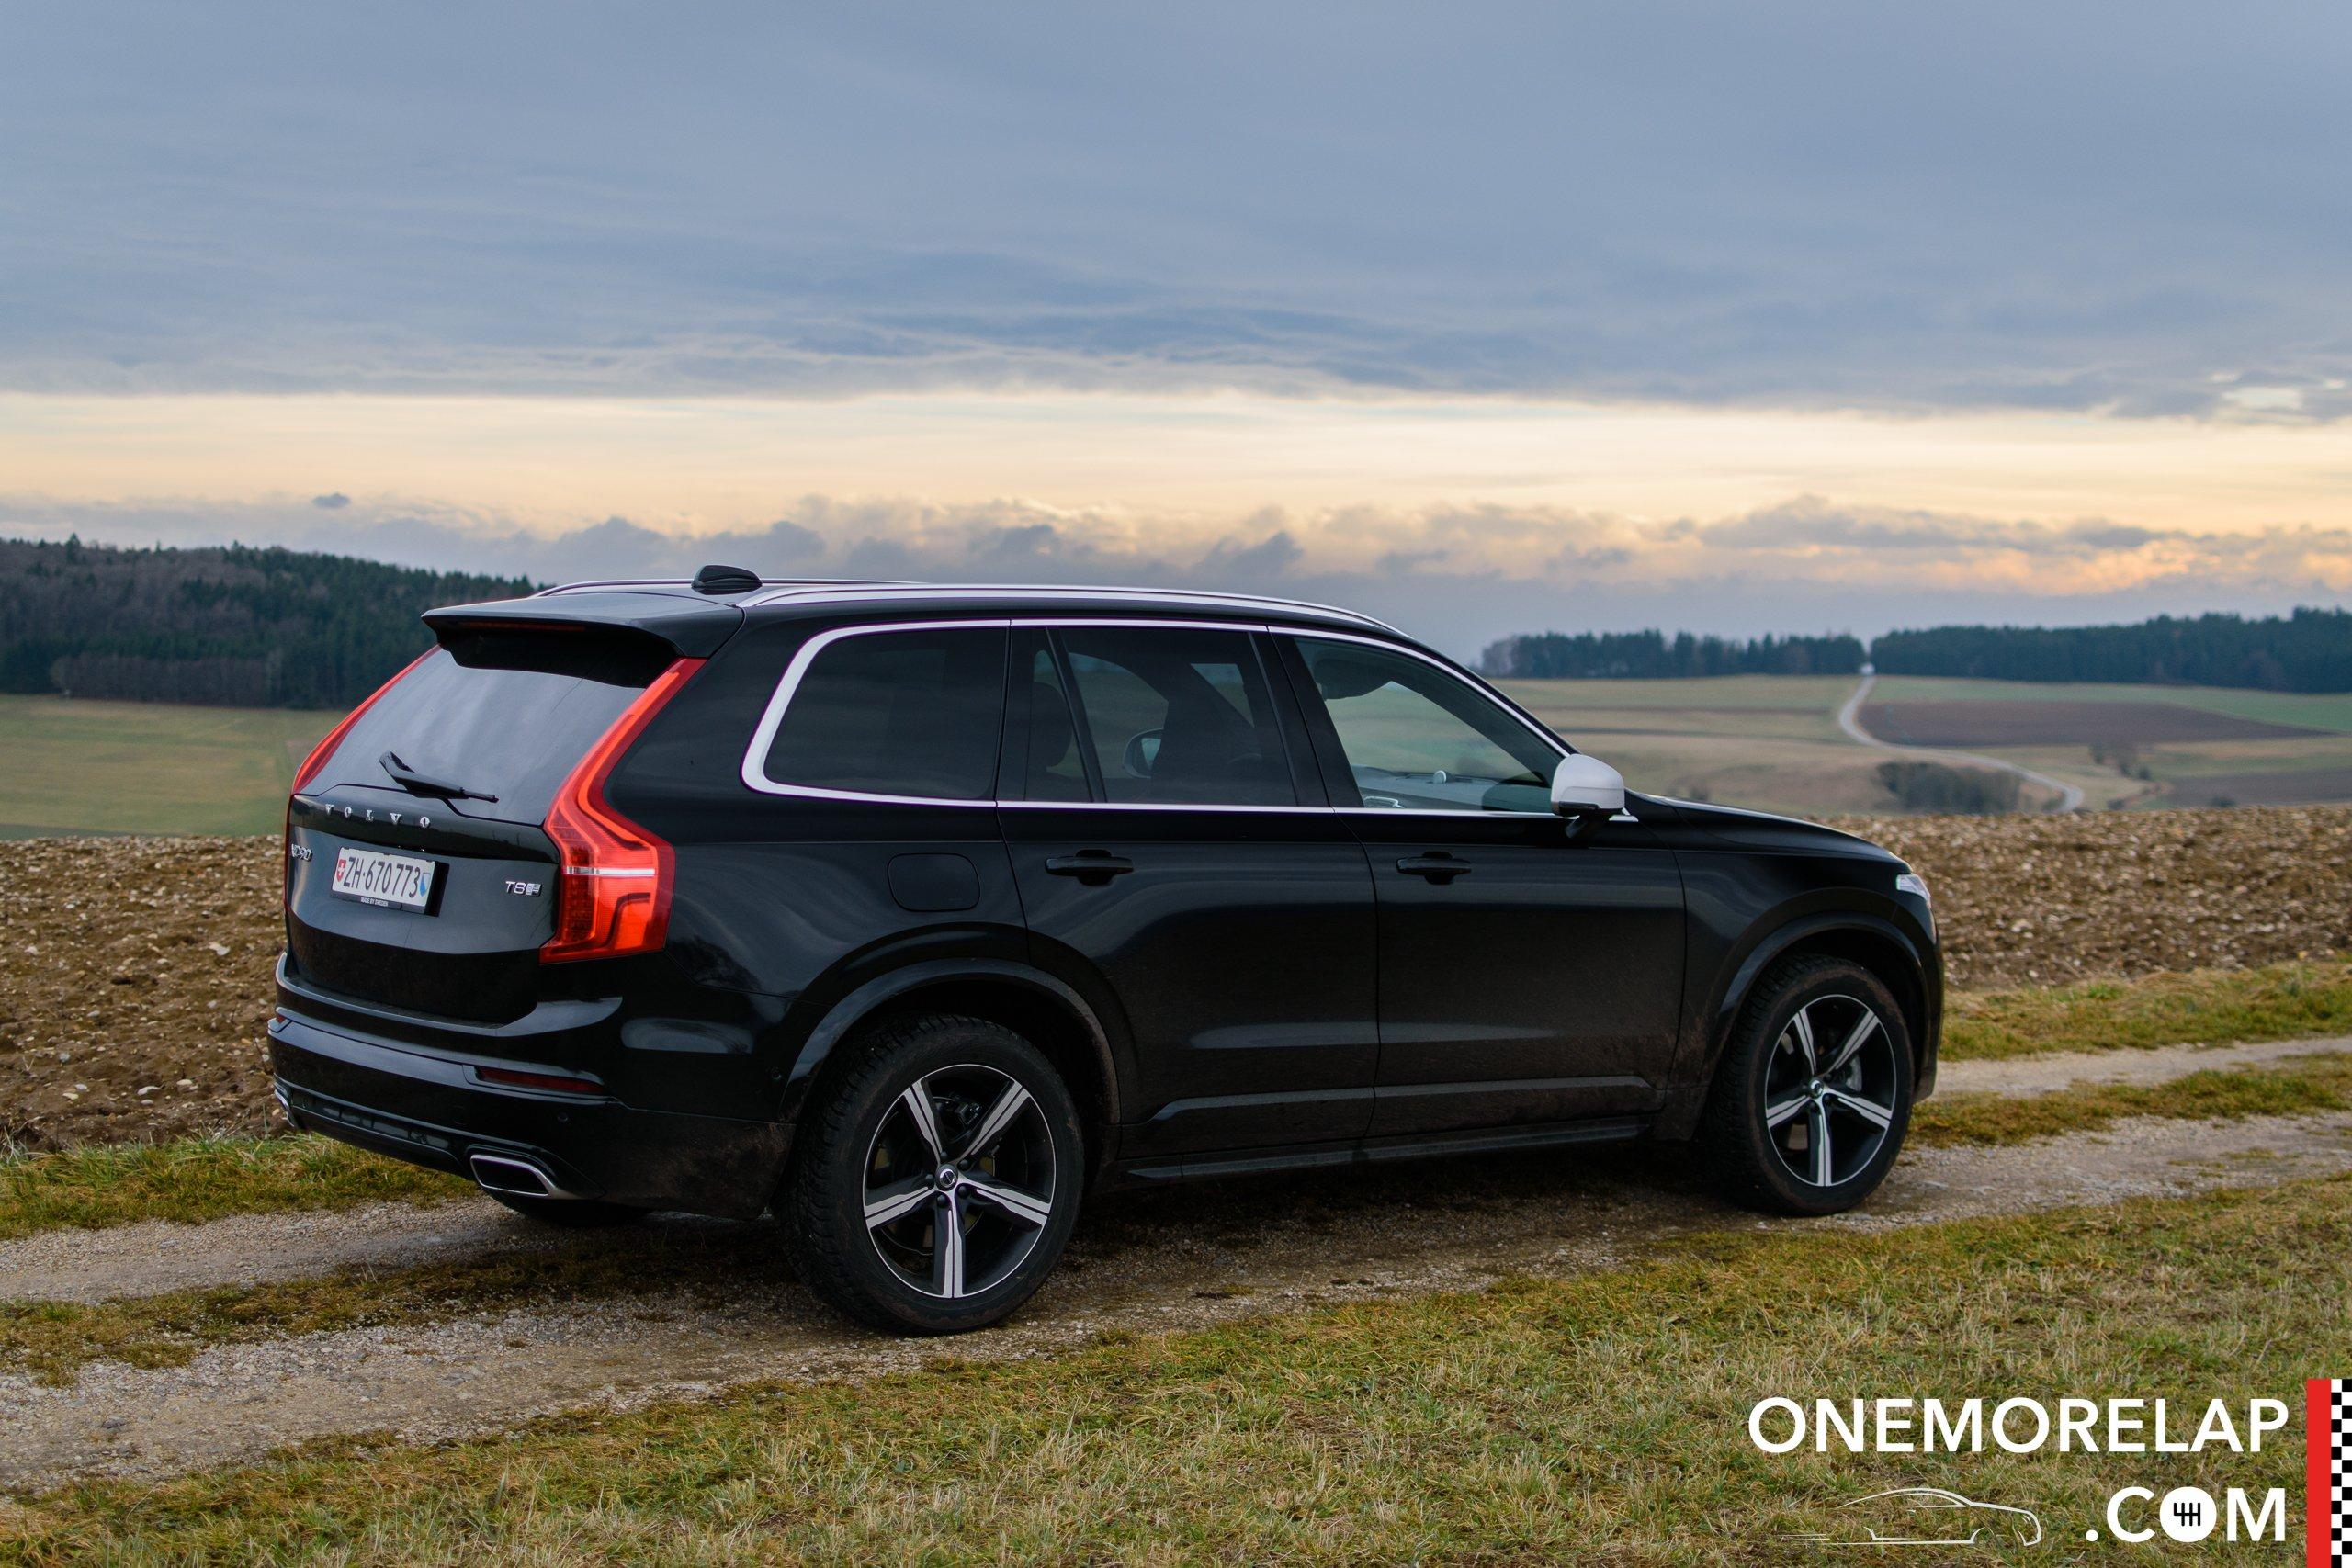 Fahrbericht: Volvo XC90 T8 Twin Engine